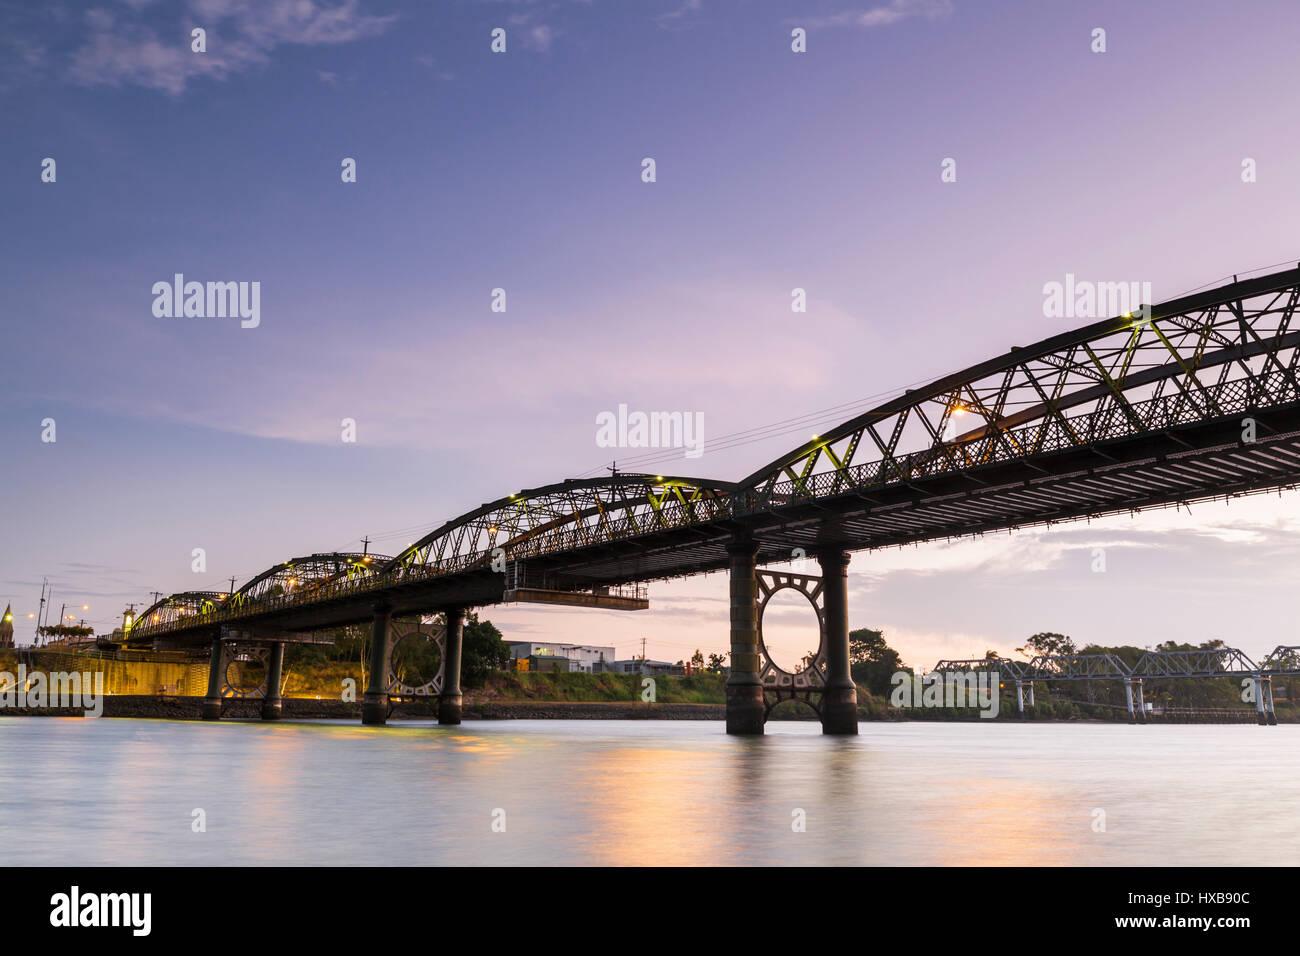 El patrimonio figuran Burnett Bridge en penumbra. Bundaberg, Queensland, Australia Imagen De Stock